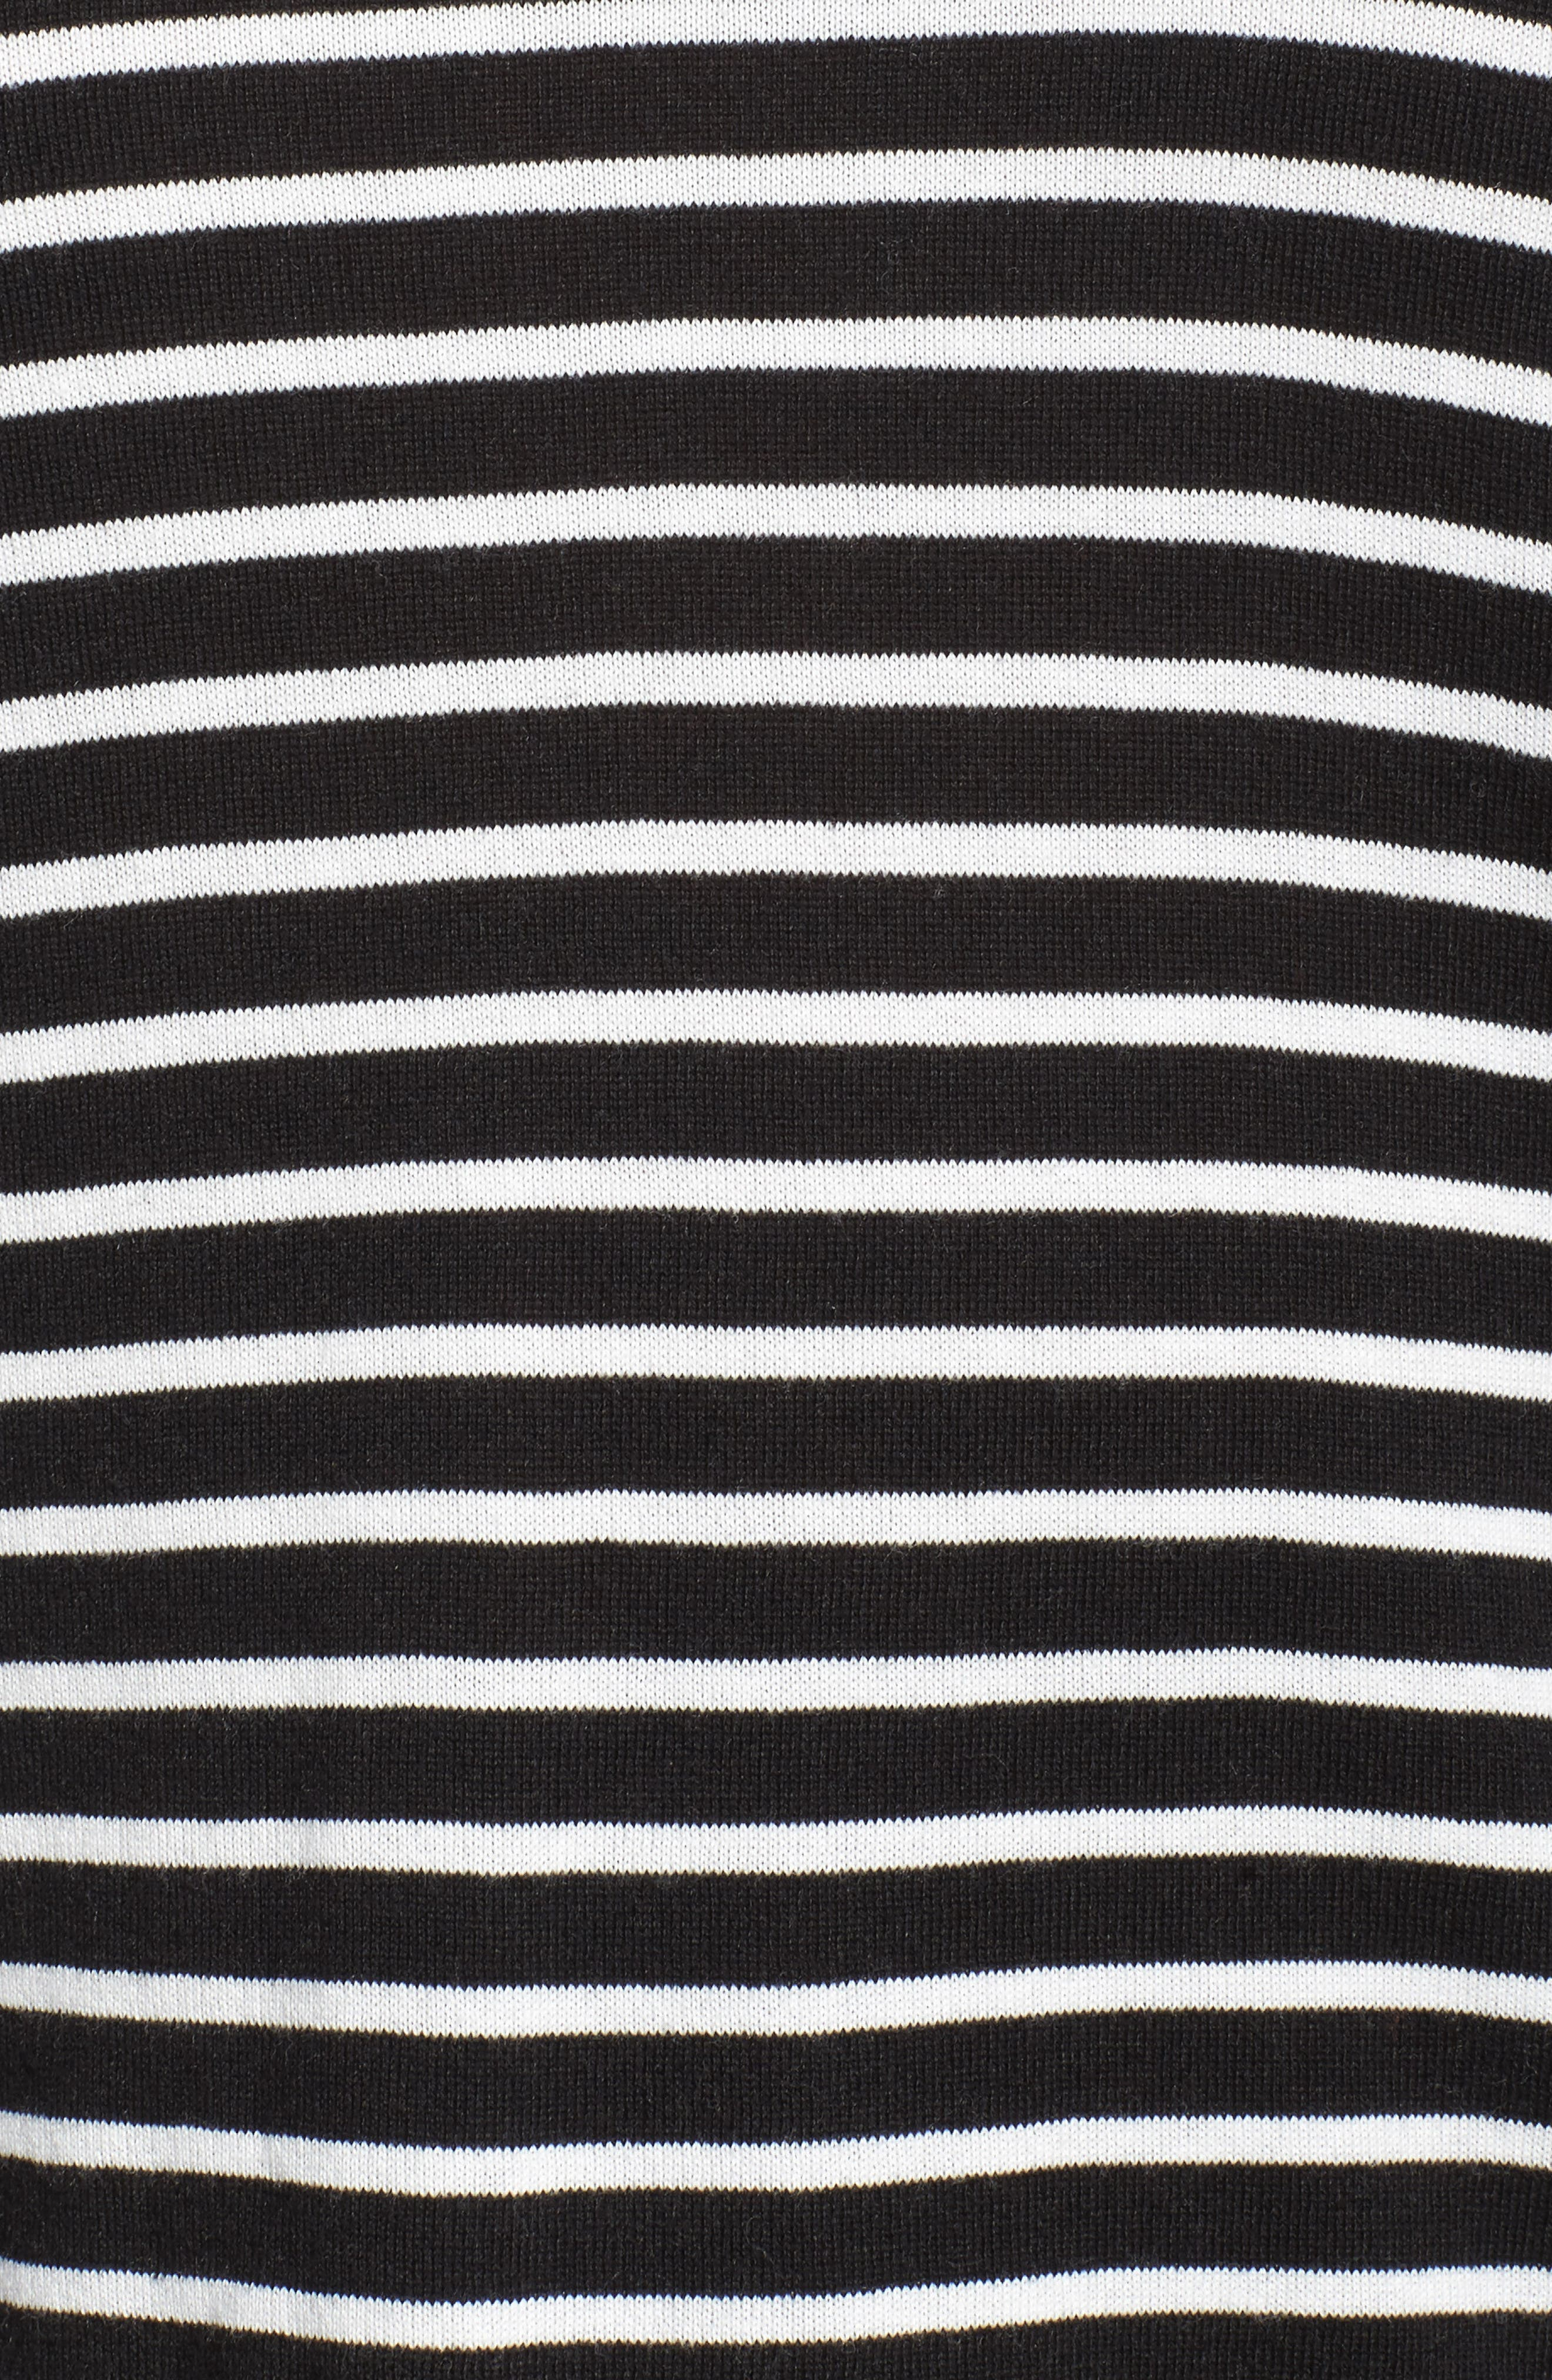 Dolman Sleeve Crewneck Sweater,                             Alternate thumbnail 5, color,                             002